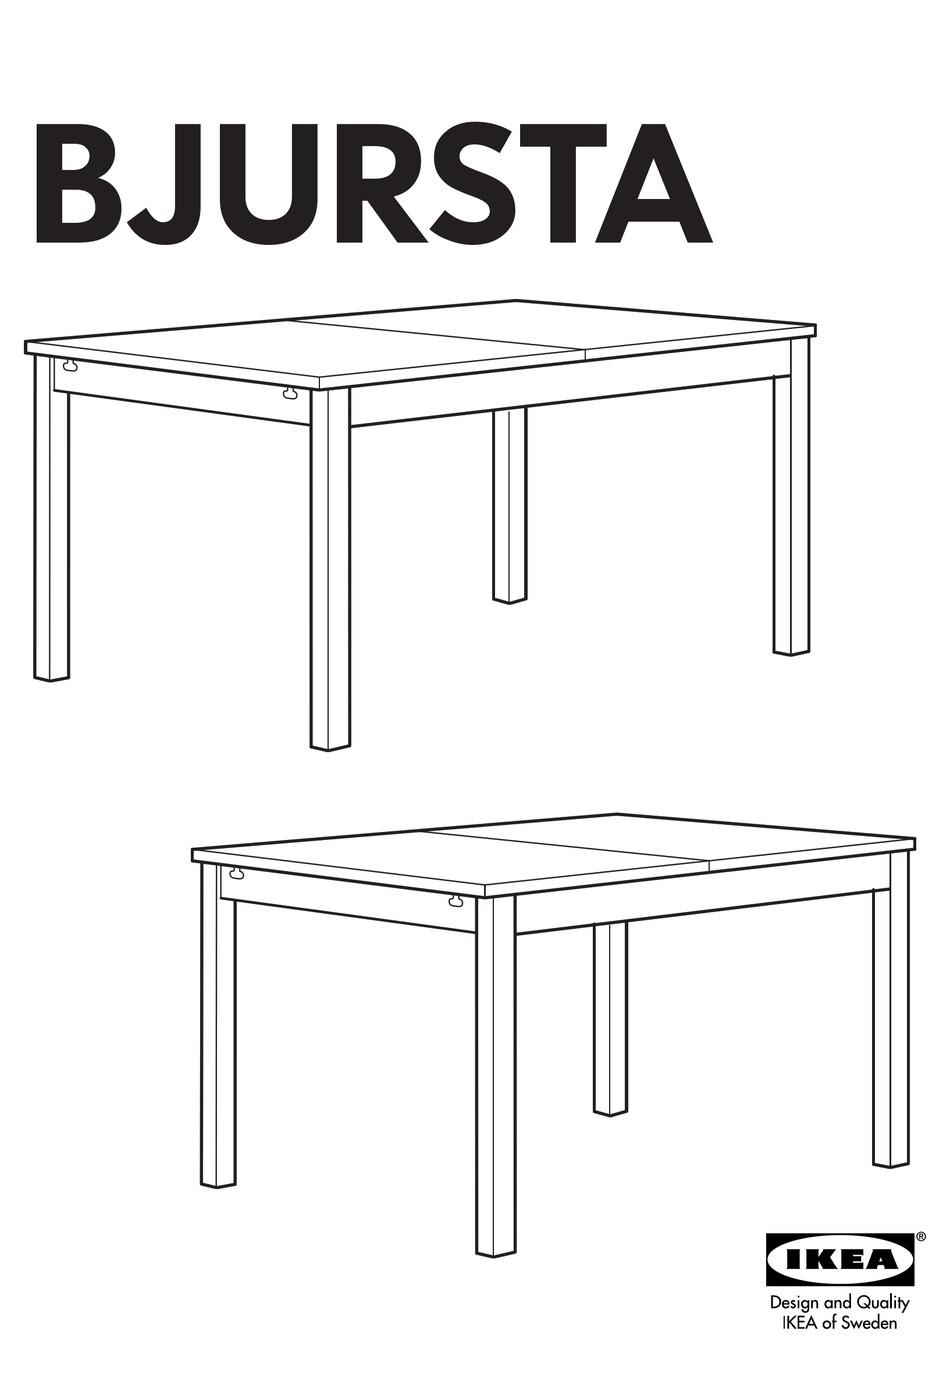 Ikea Bjursta Dining Table 55x33 Instructions Manual Pdf Download Manualslib